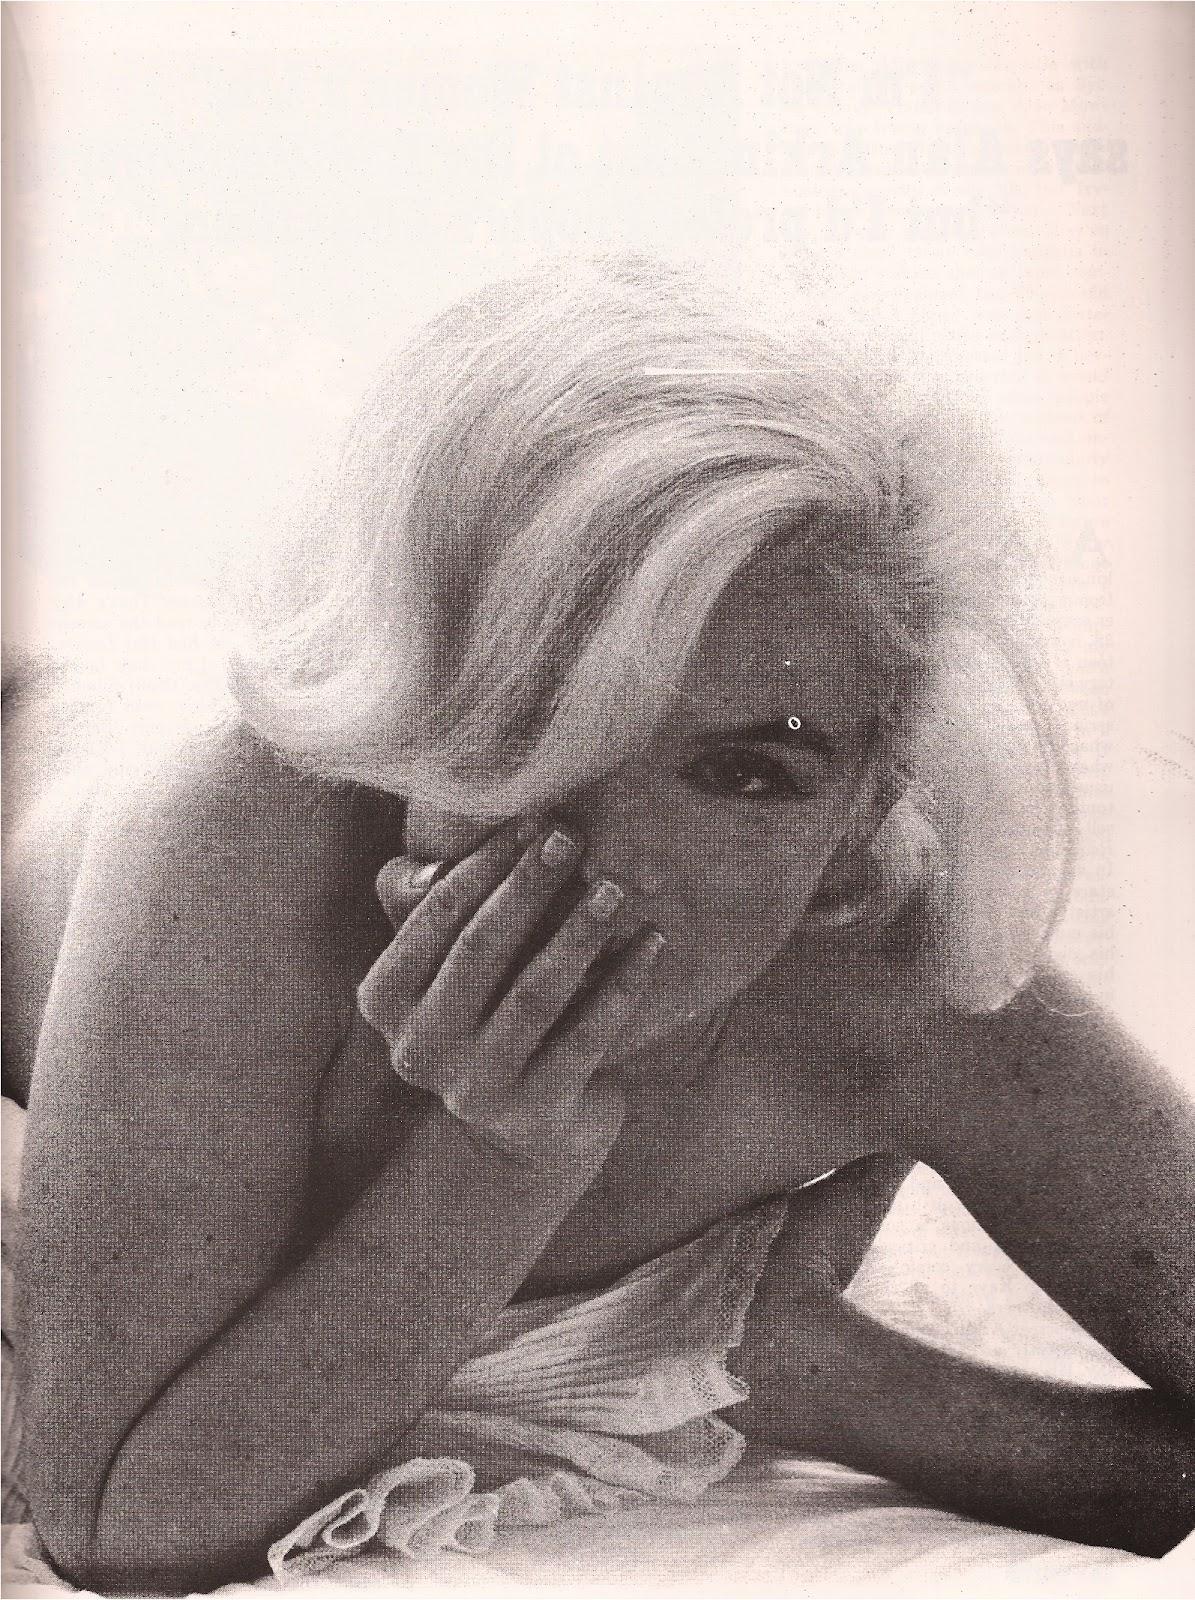 http://3.bp.blogspot.com/-NOFs56MtVmw/T671U3eGVAI/AAAAAAAAGNs/J-aY6m0NQqY/s1600/Marilyn+Monroe+Show+Magazine+9%253A72+-3-+2.jpg